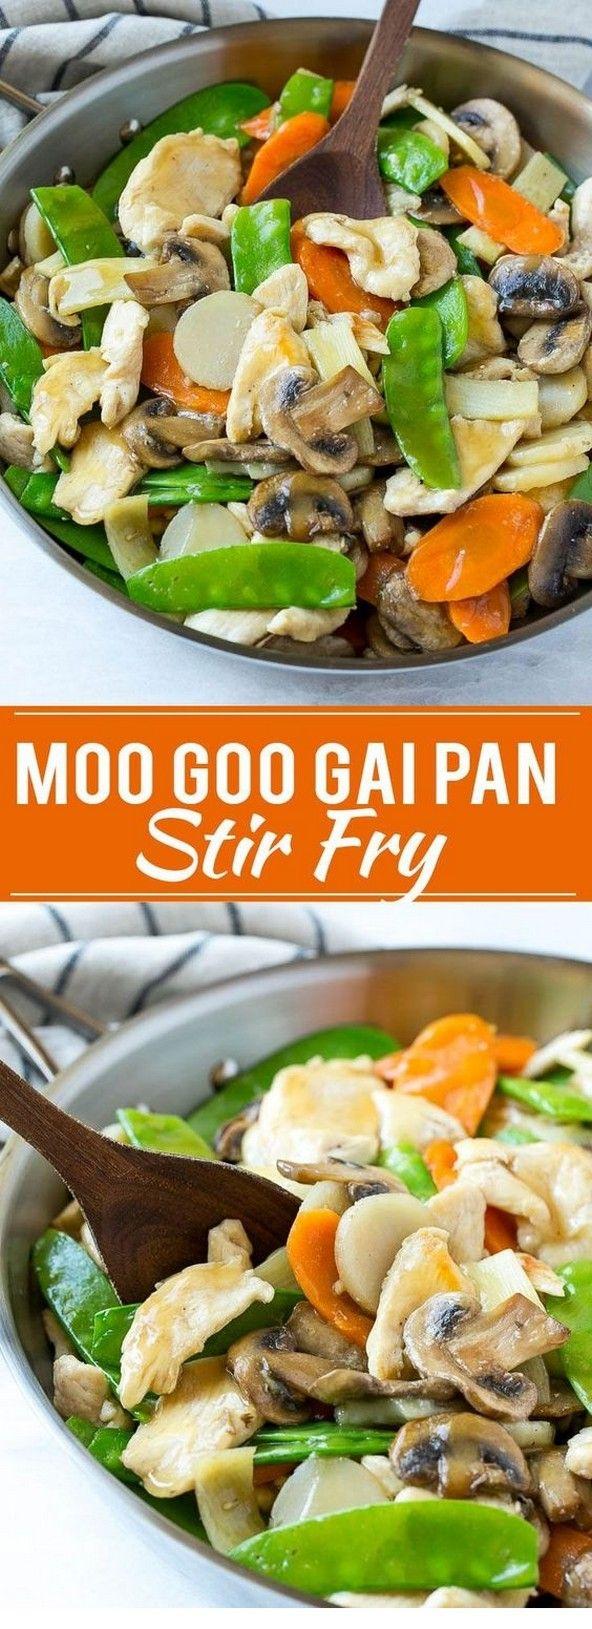 Moo Goo Gai Pan | Chinese Recipes Easy #chinesefood